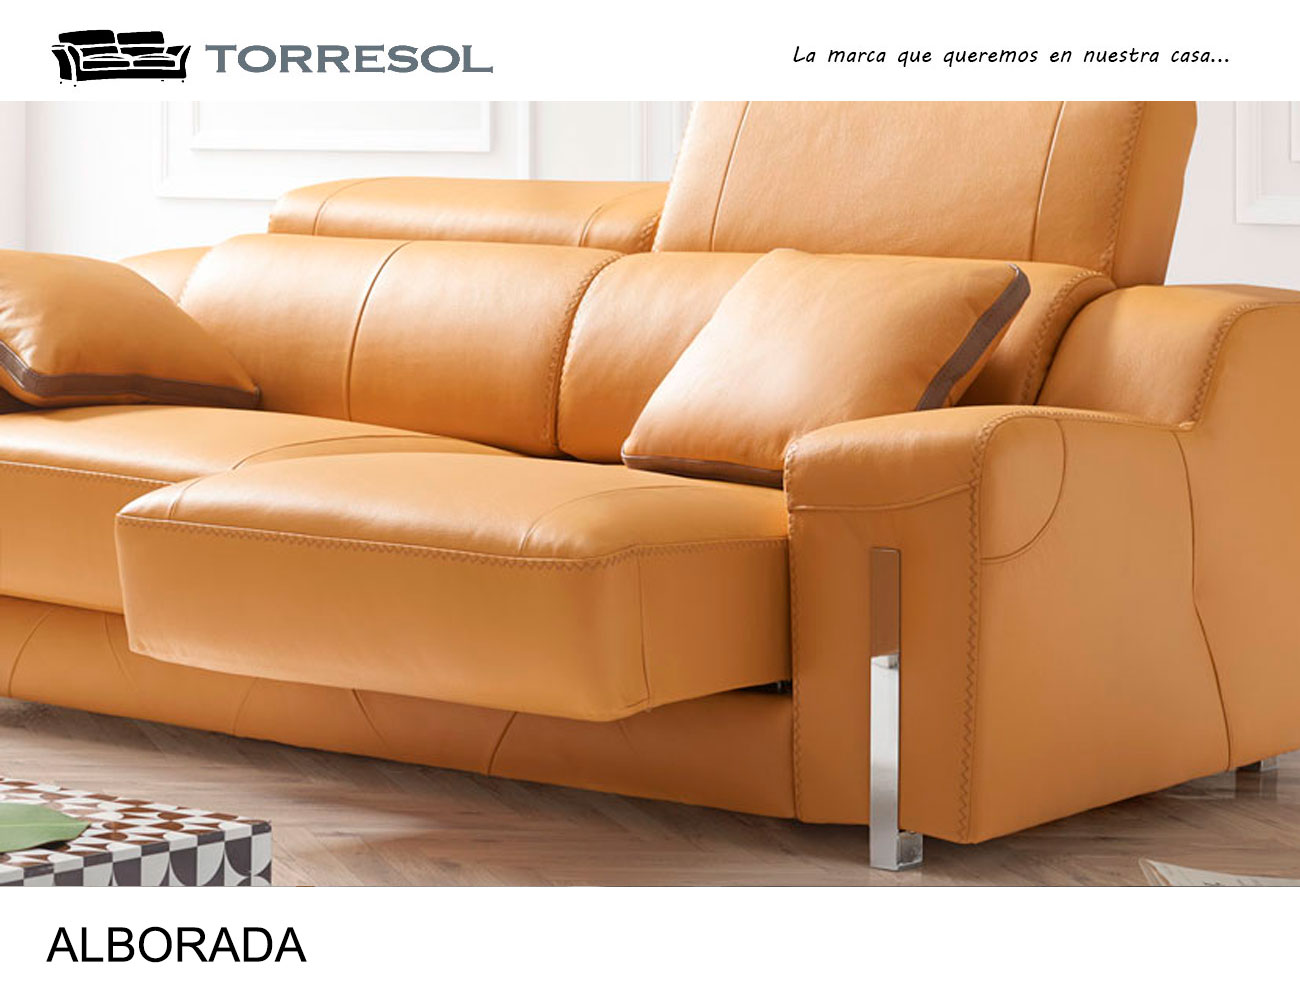 Sofa alborada torresol 3